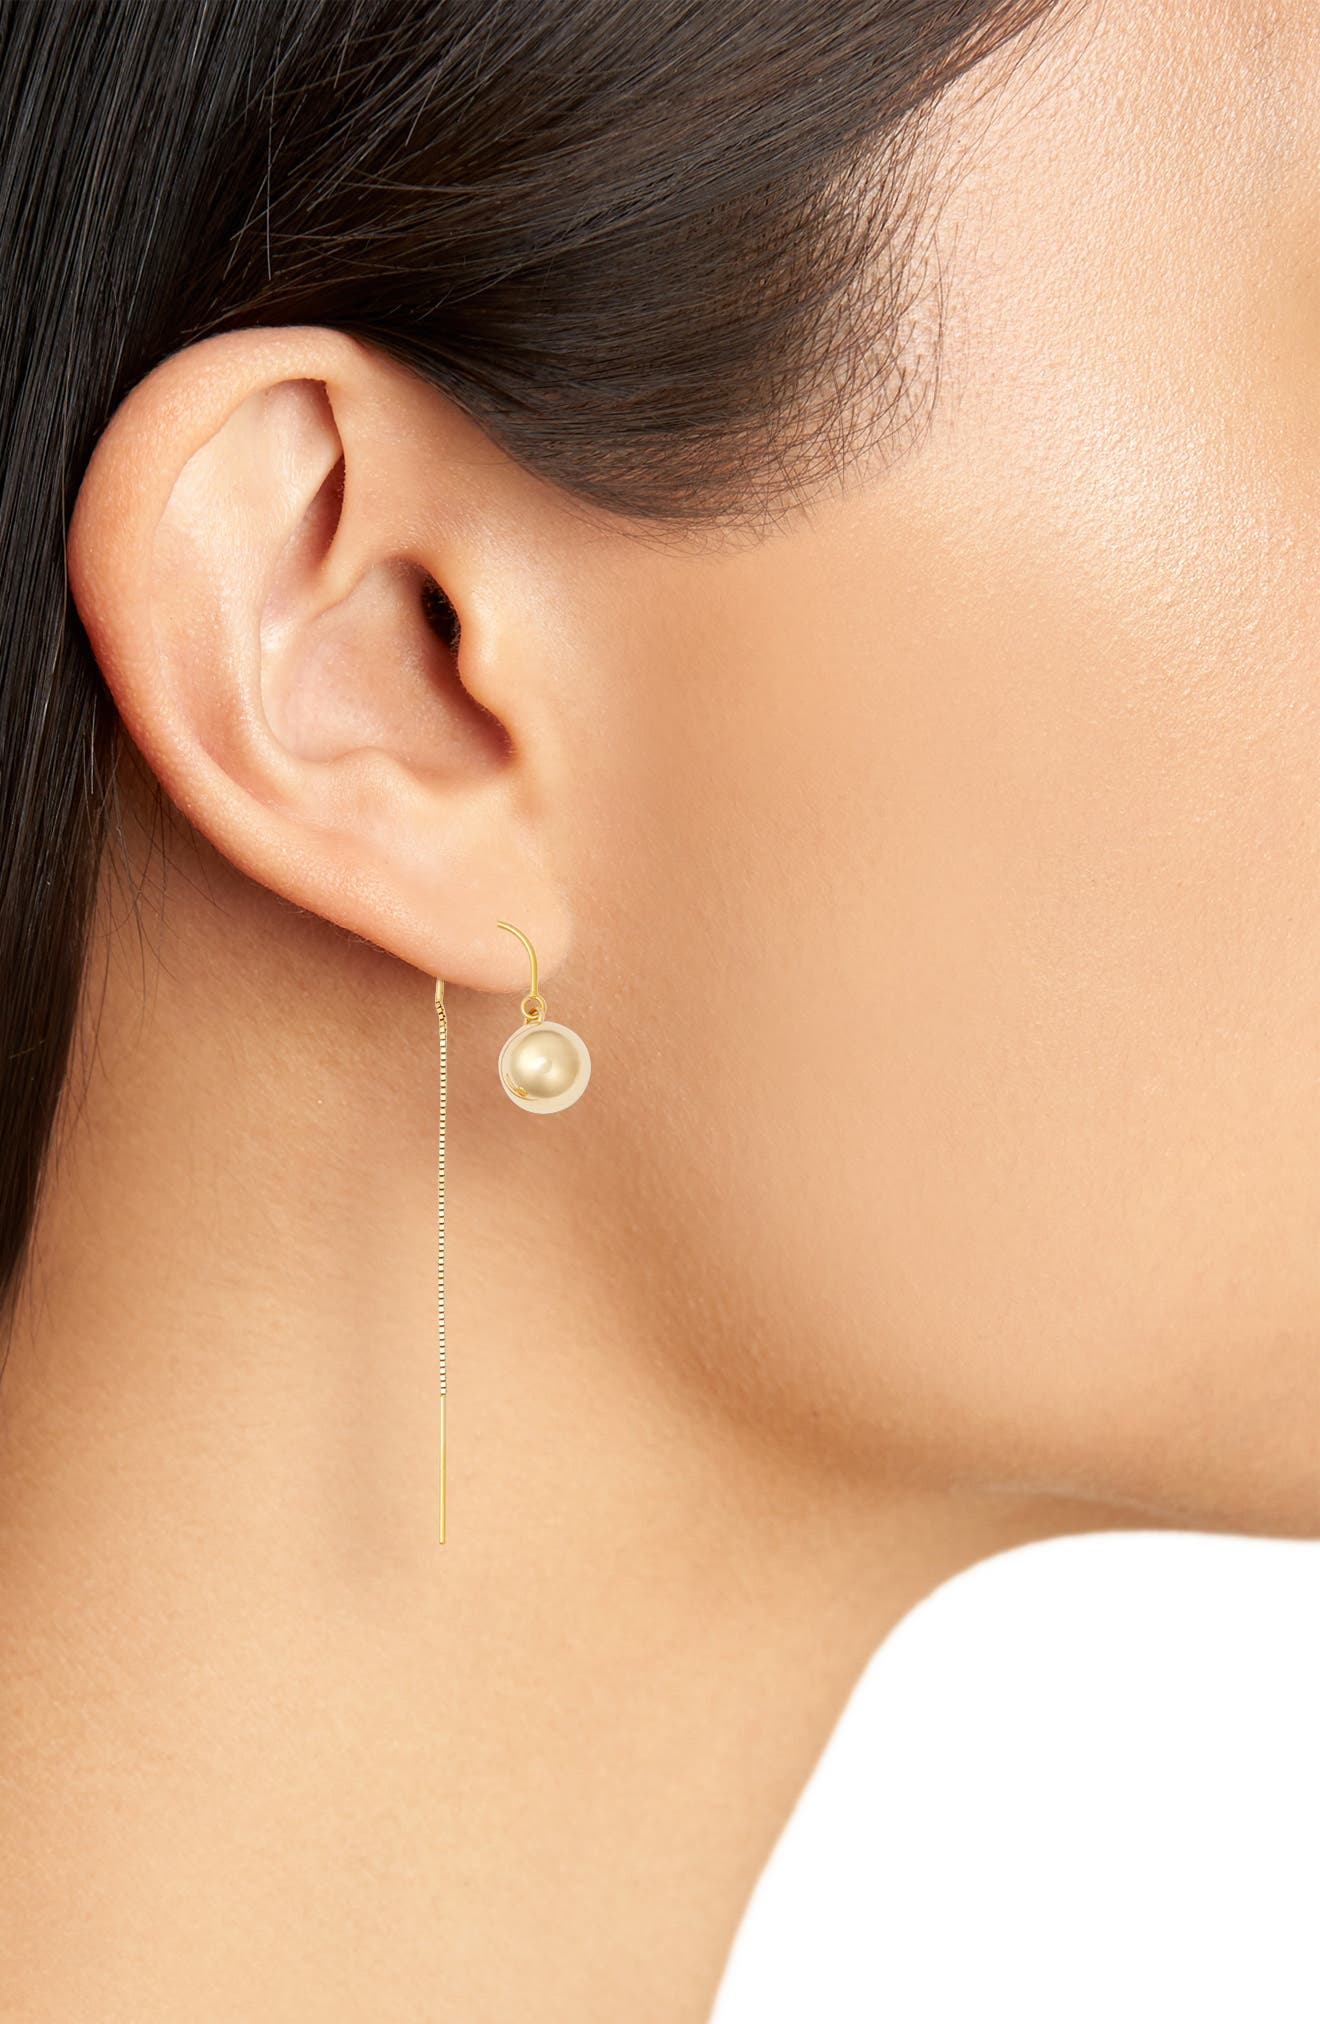 Gold Ball Threader Earrings,                             Alternate thumbnail 2, color,                             Yellow Gold